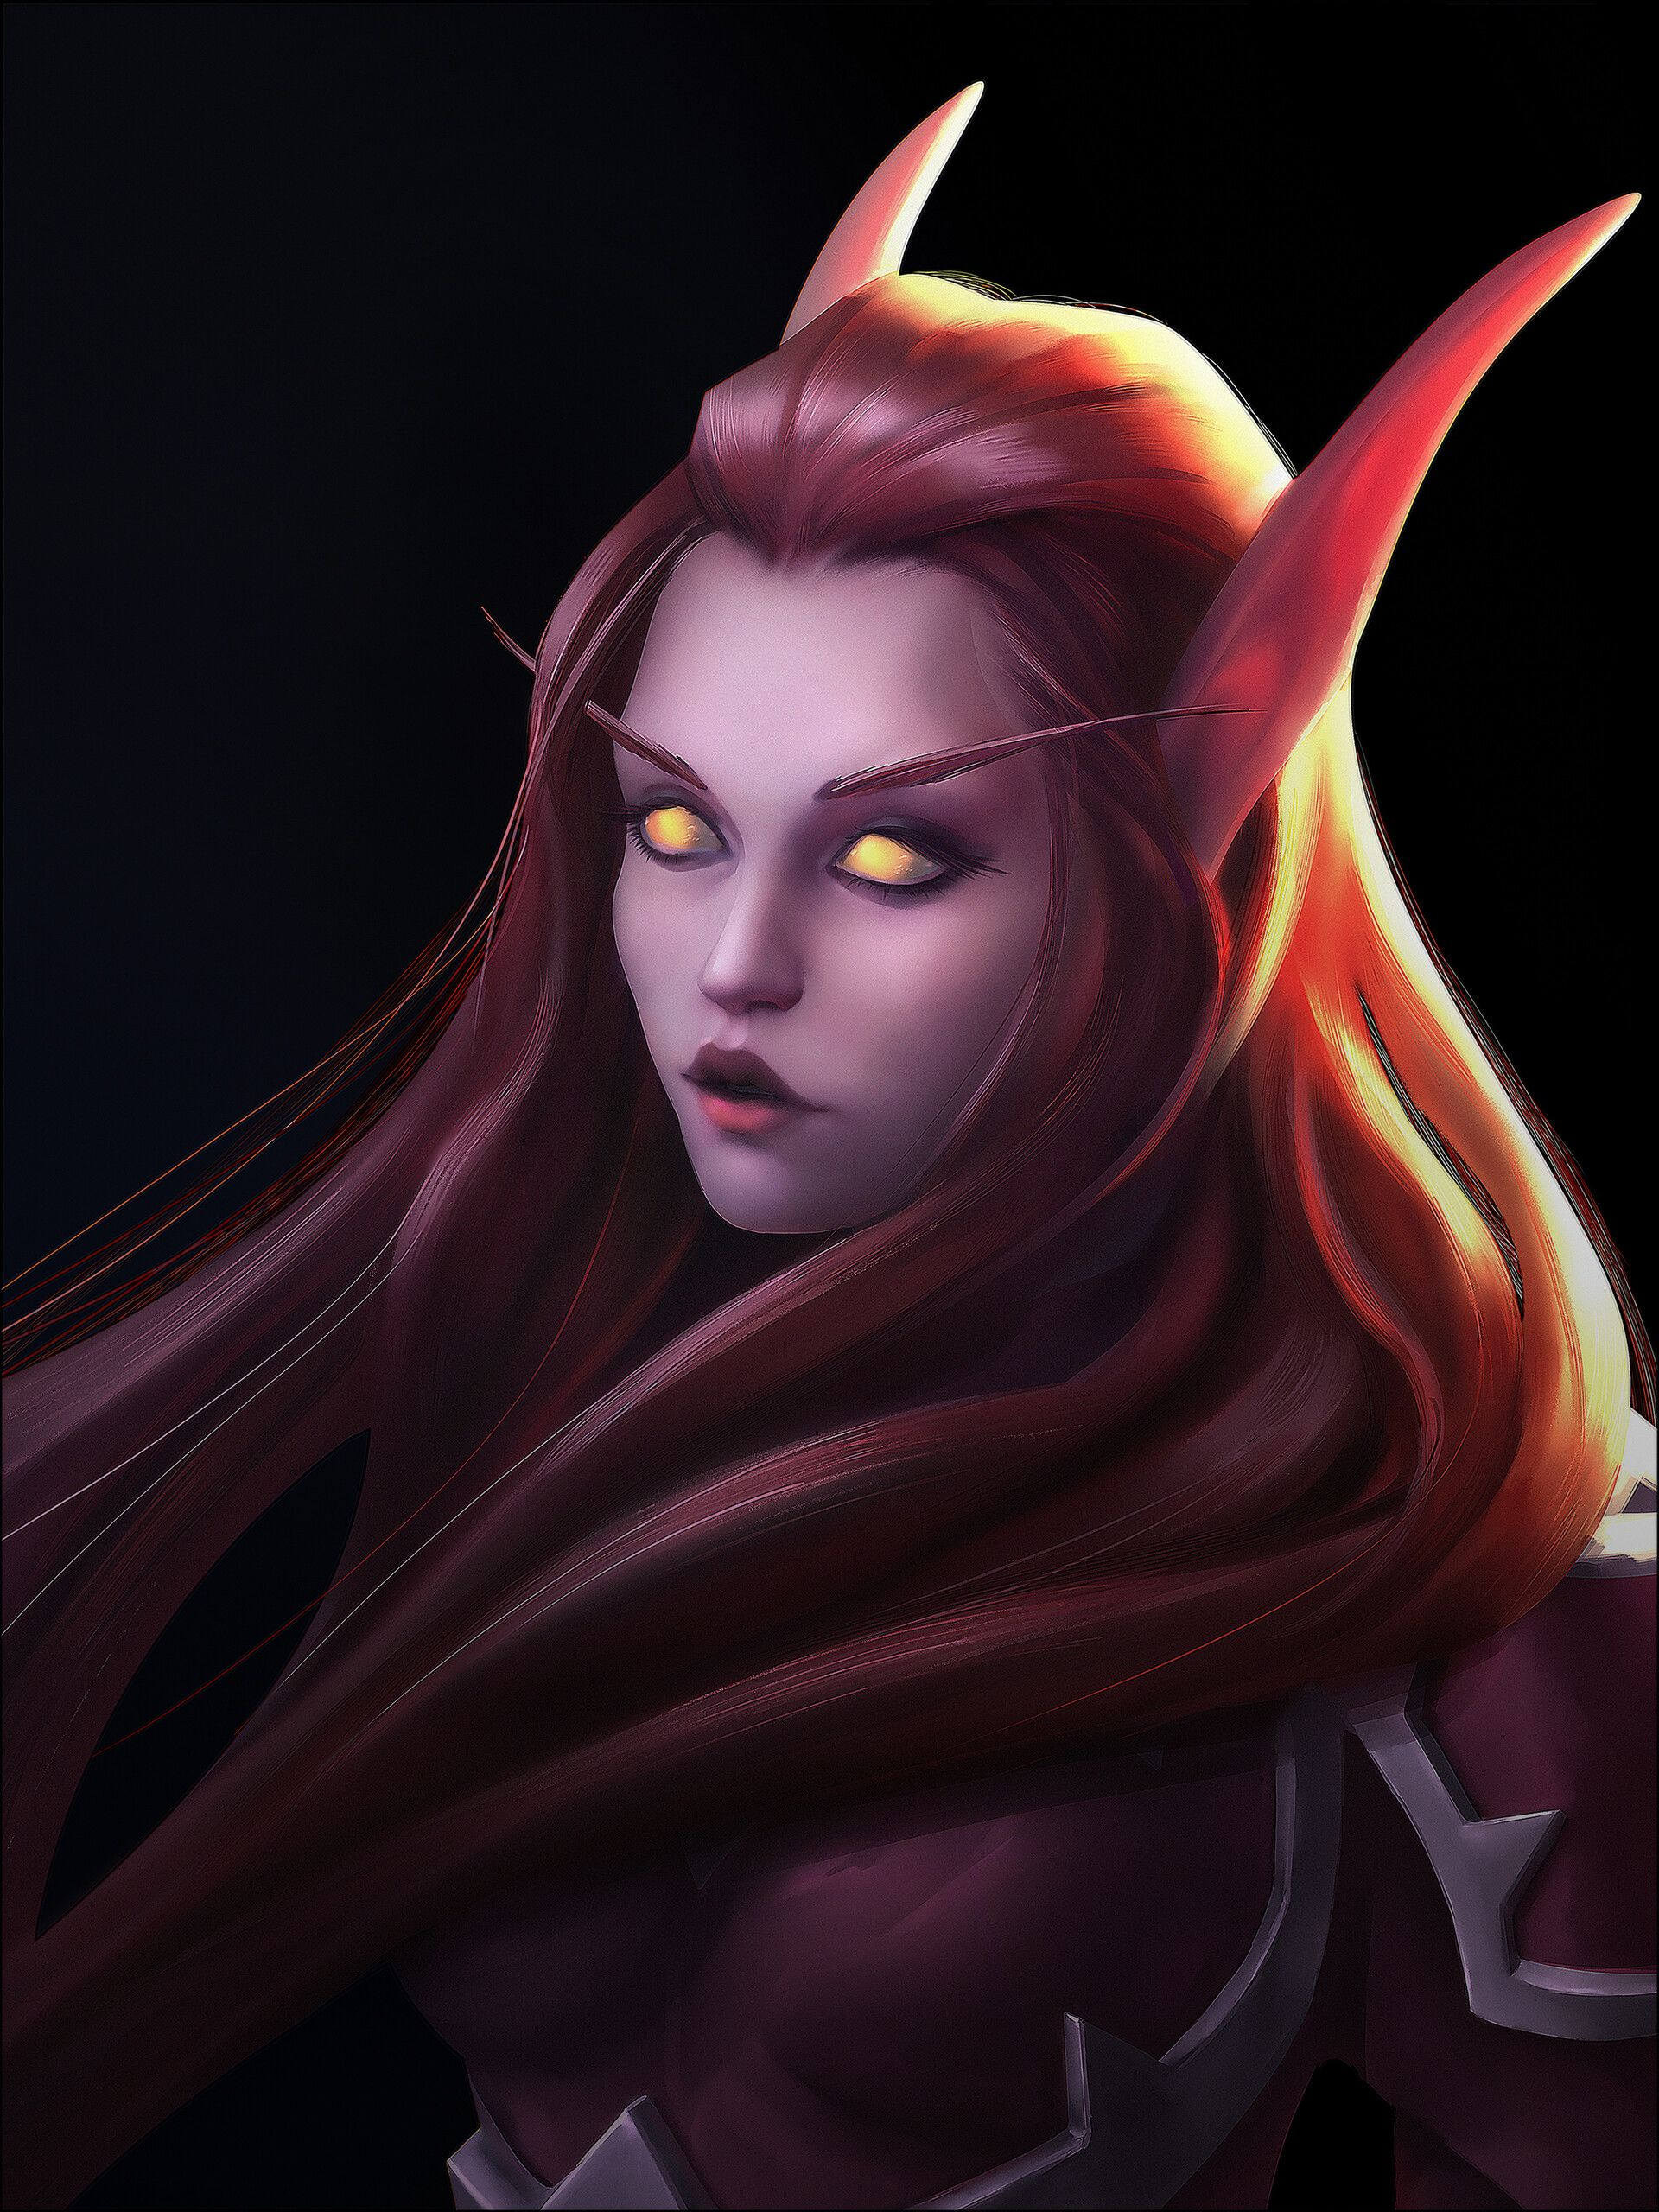 ArtStation - Warcraft blood elf girl fanart portrait, Alina Snit